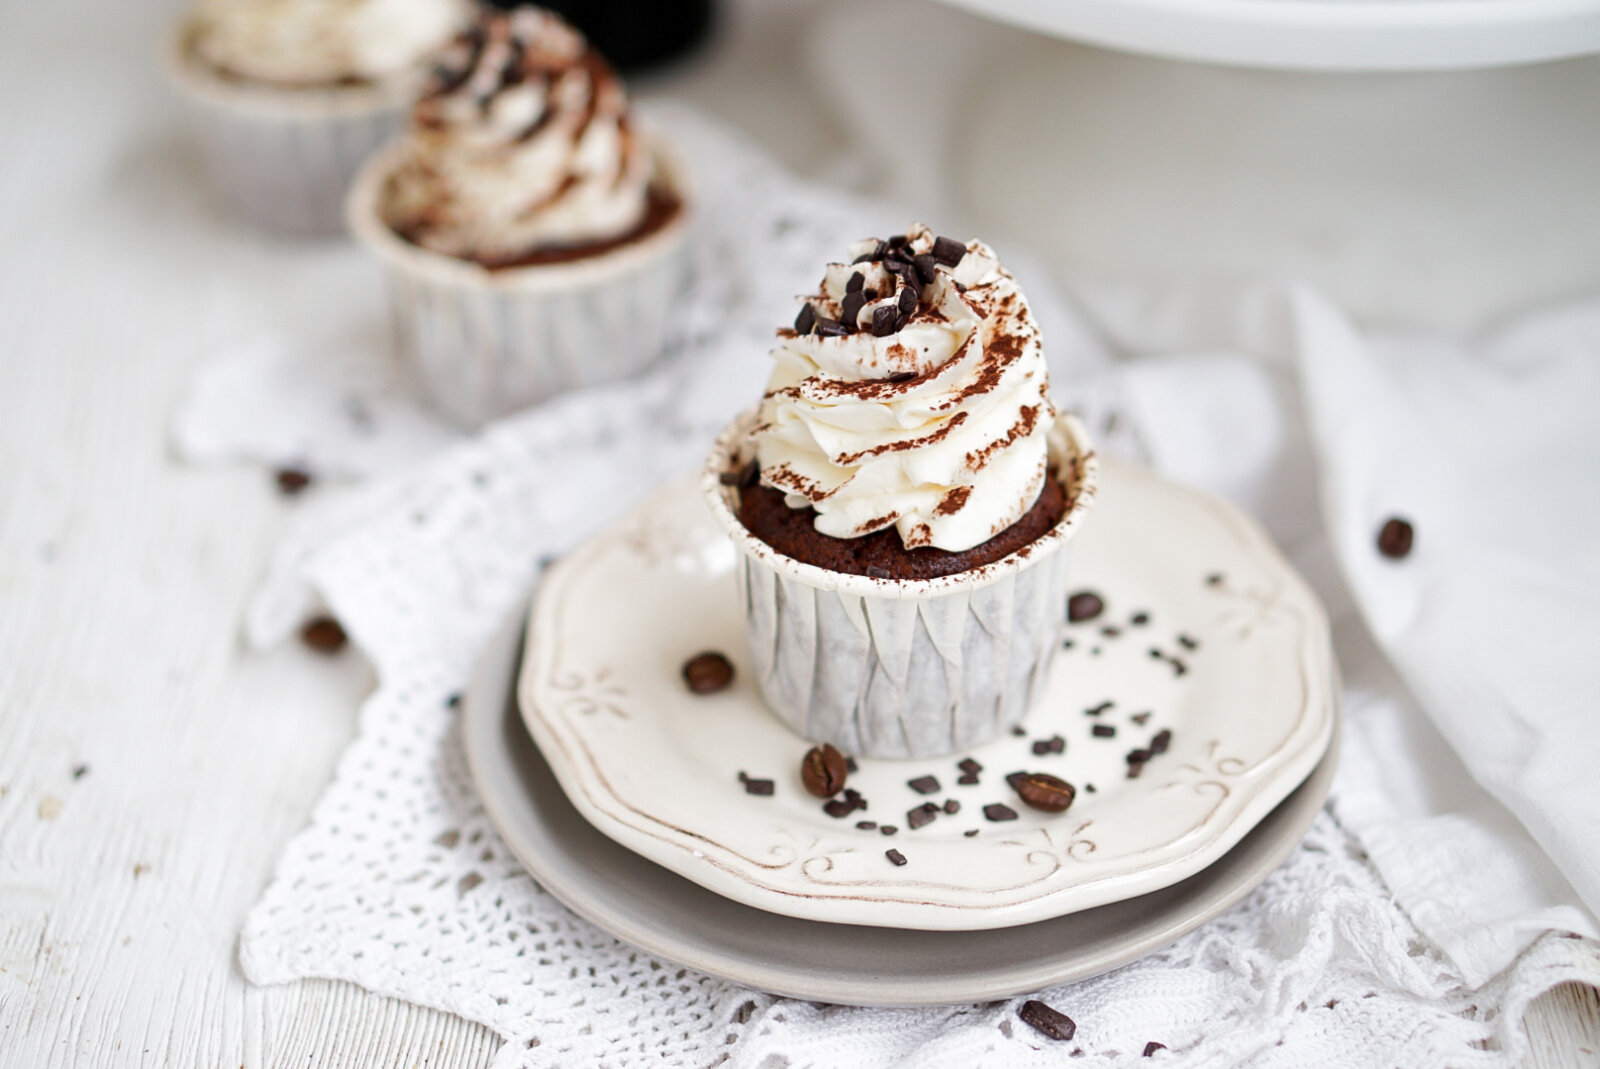 Шоколадные капкейки Бейлиз и взбитый ганаш на белом шоколаде – Mary Bakery